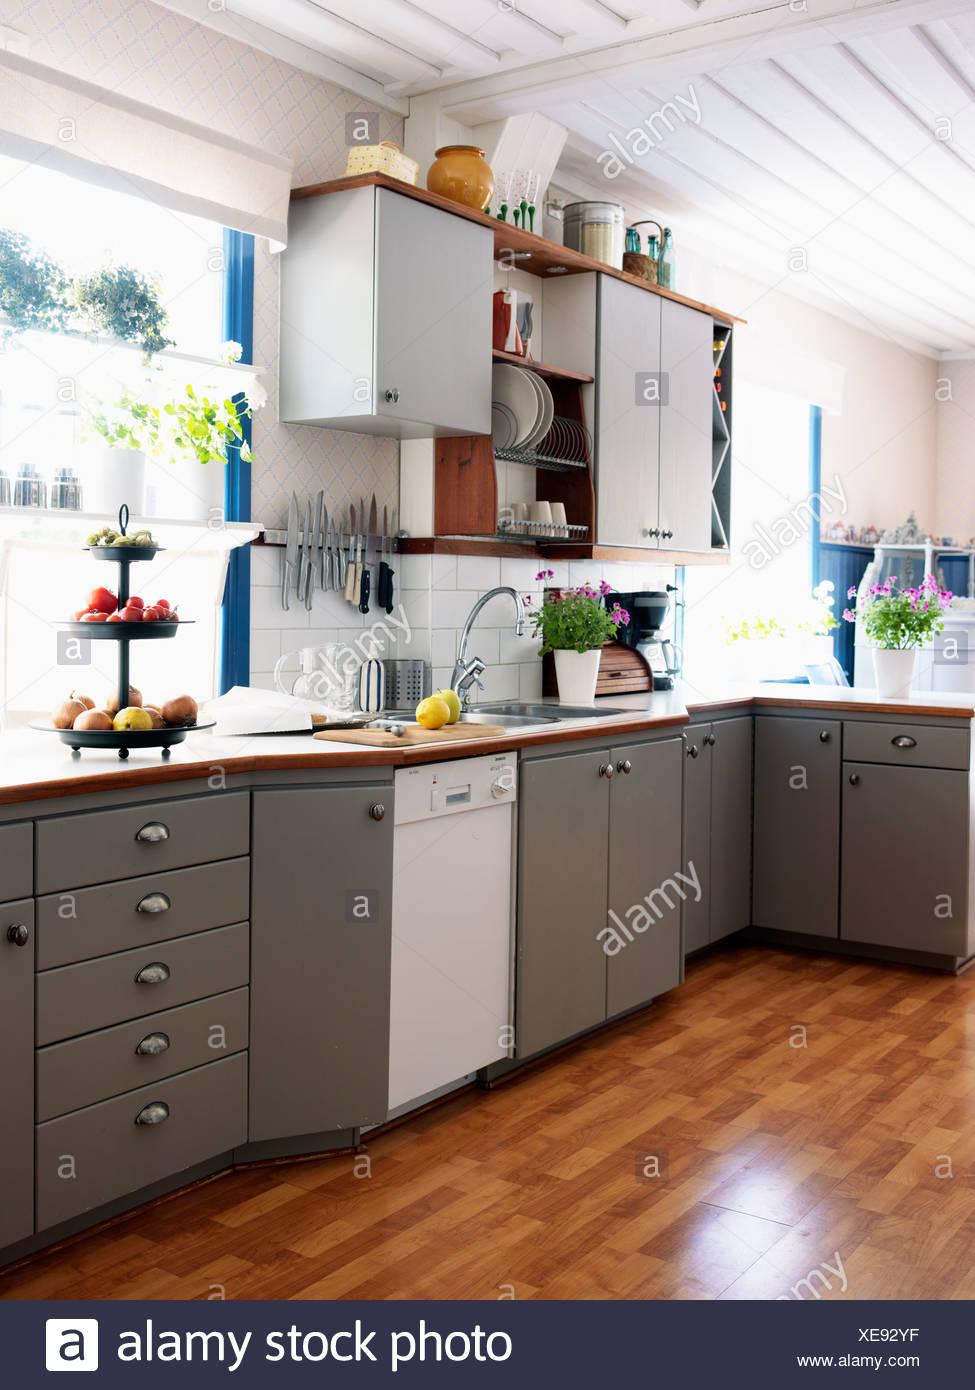 Modern kitchen design - Stock Image